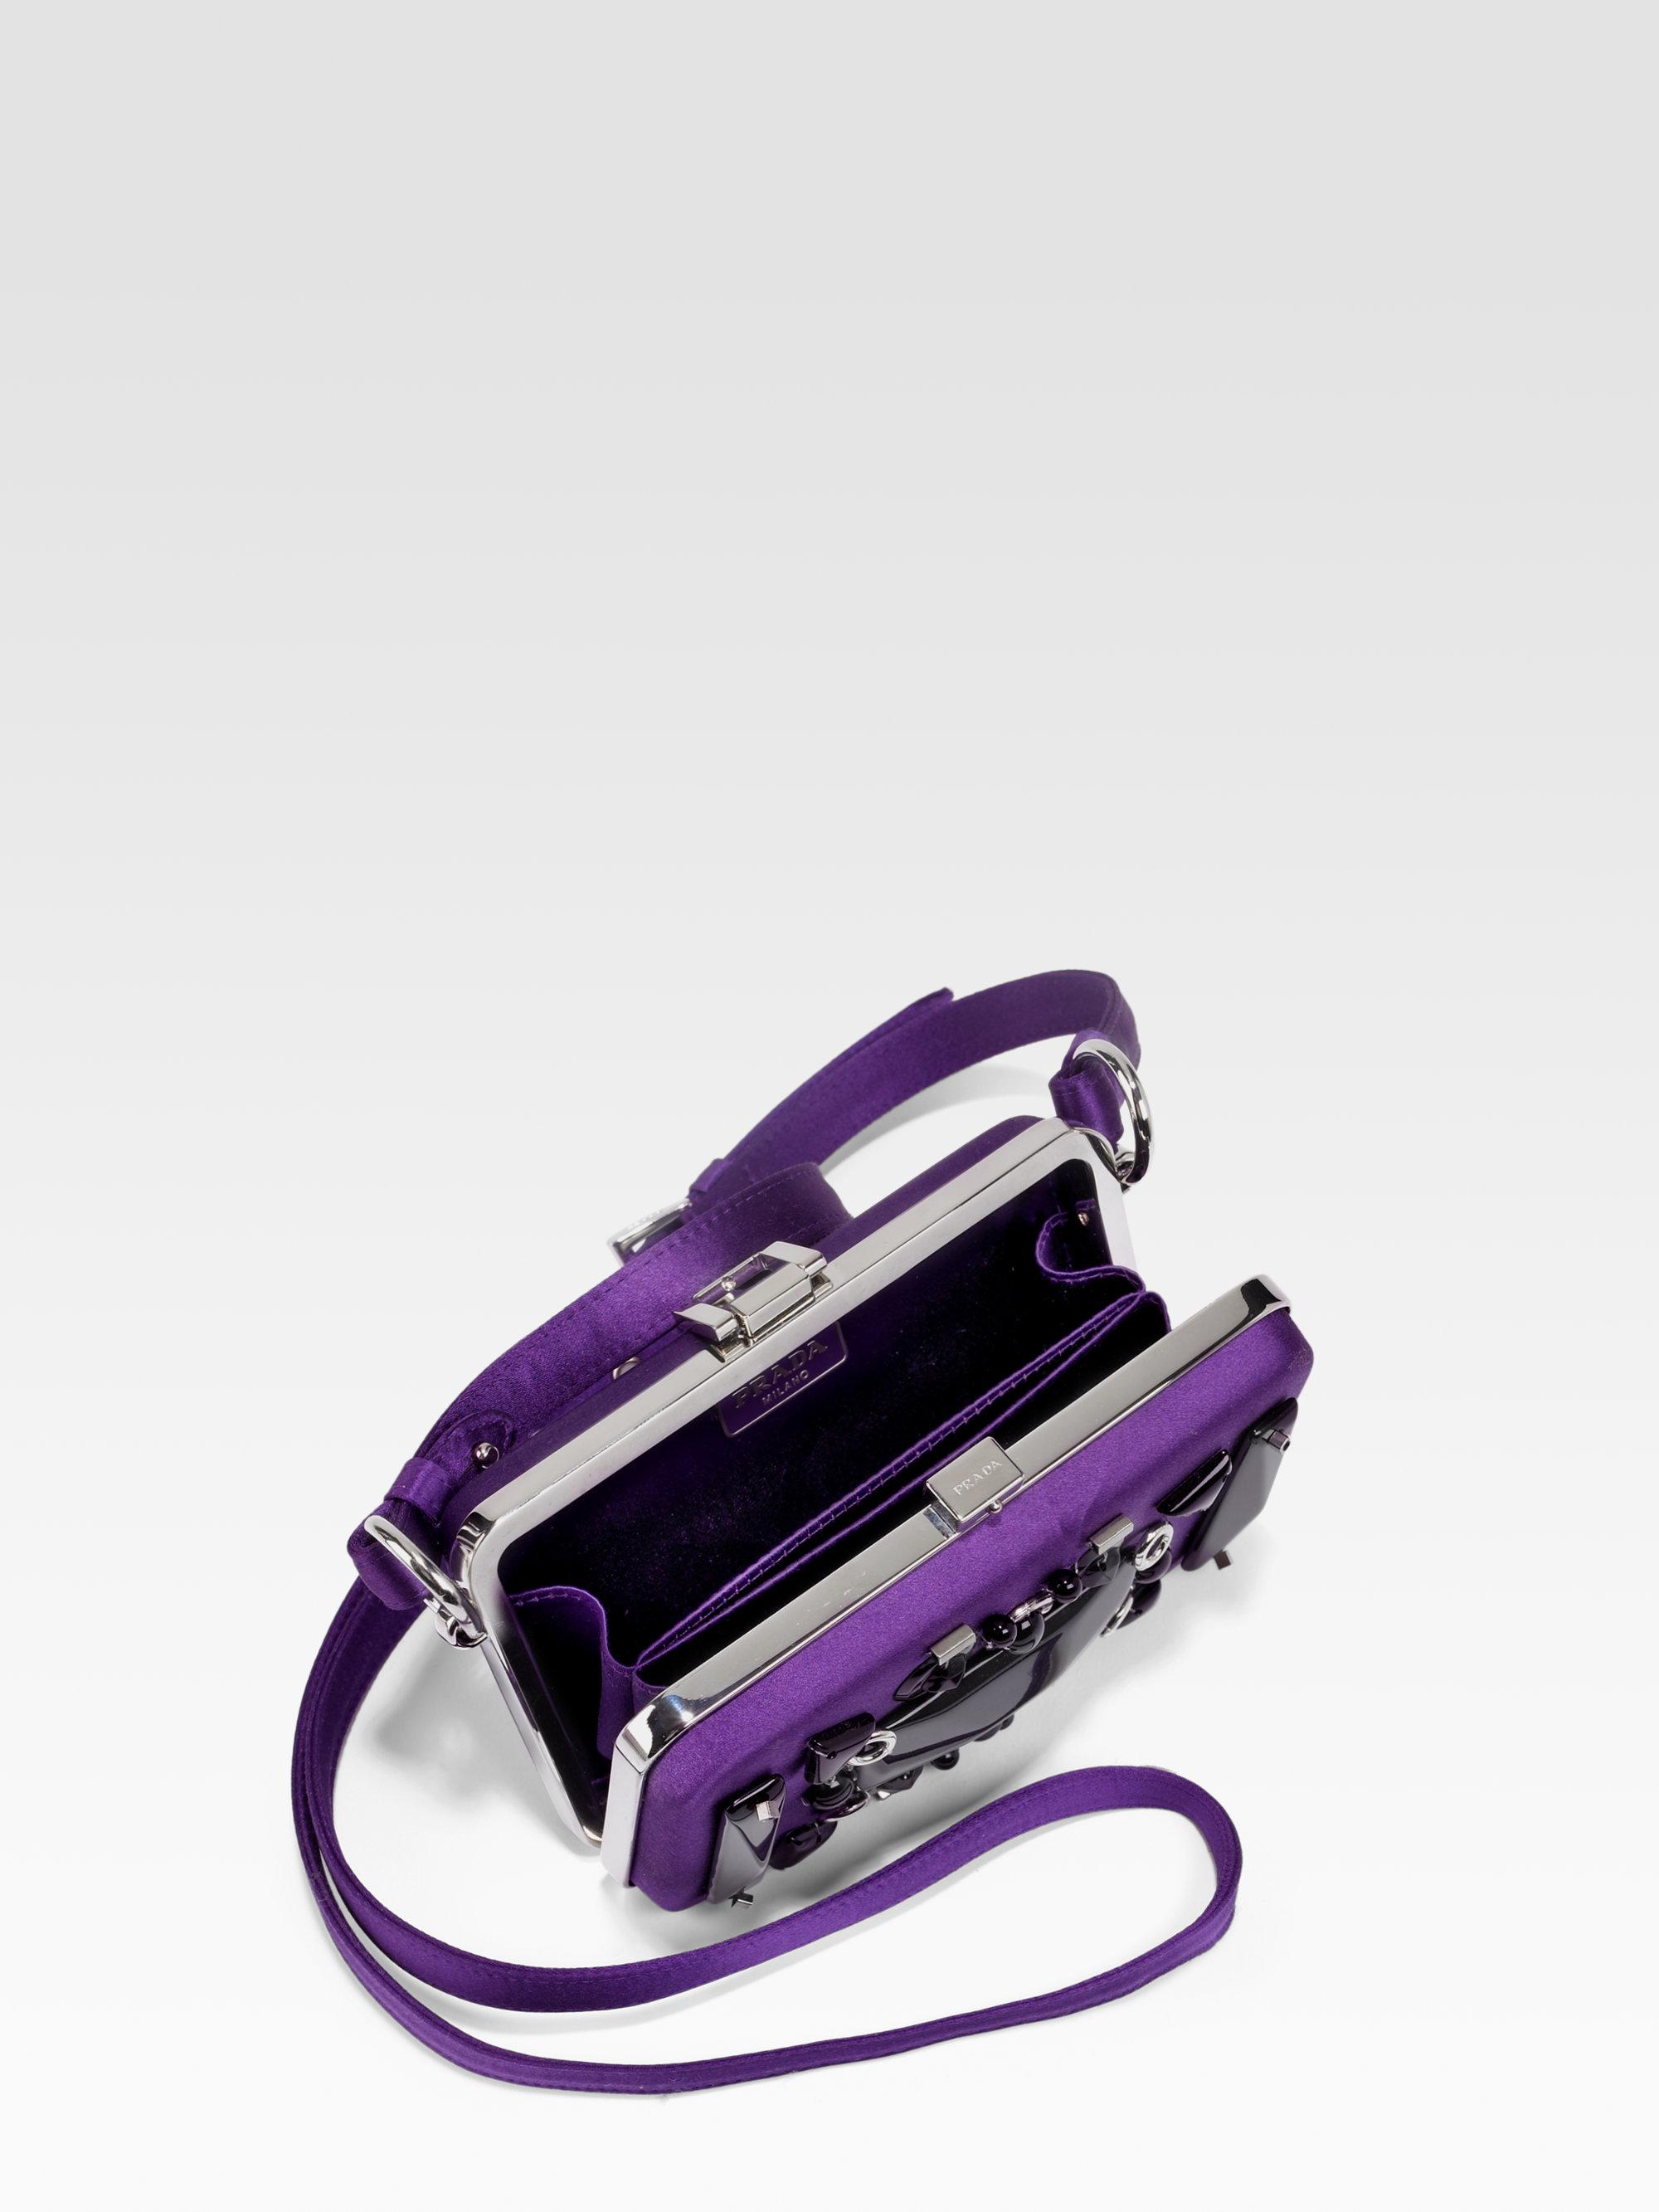 prada bags for sale - Prada Raso Ricamo Satin Box Clutch in Purple (violet) | Lyst